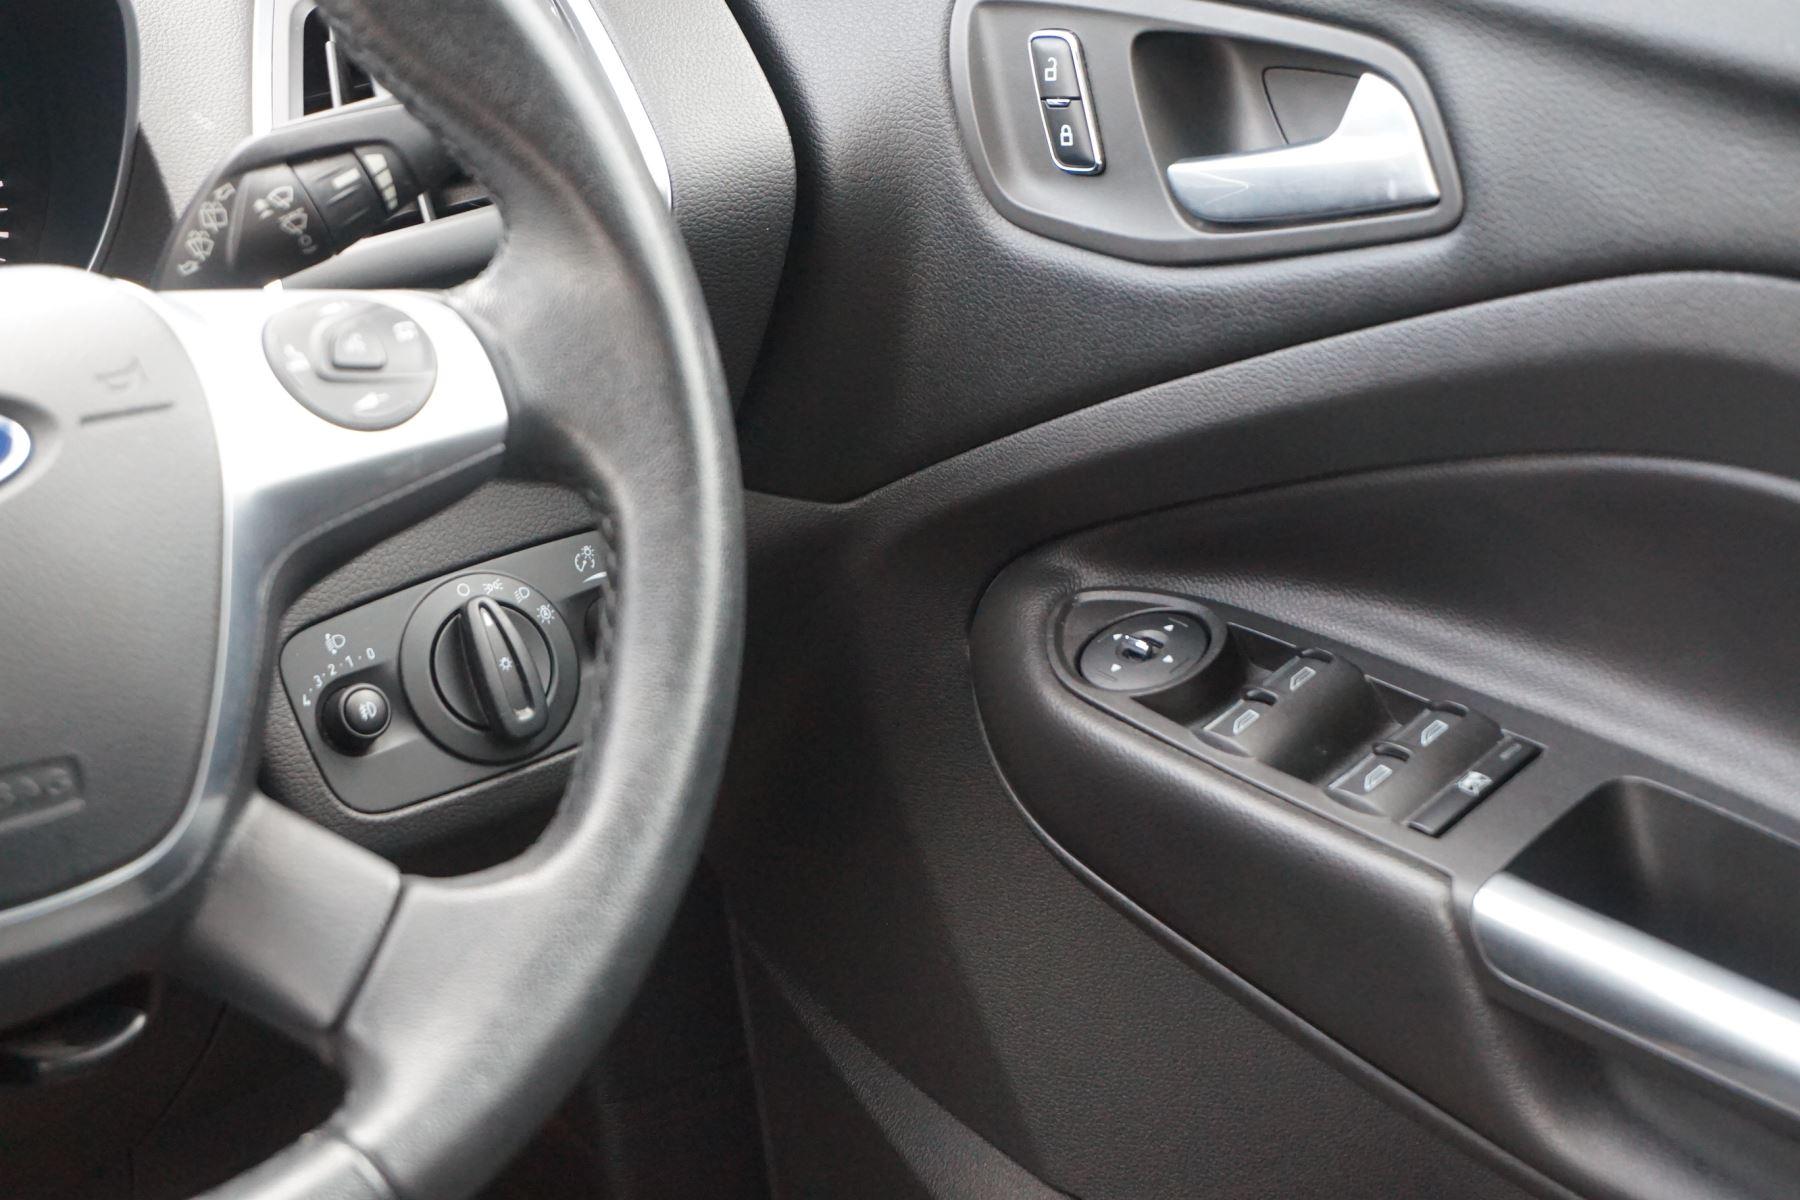 Ford Kuga 2.0 TDCi Titanium 2WD image 14